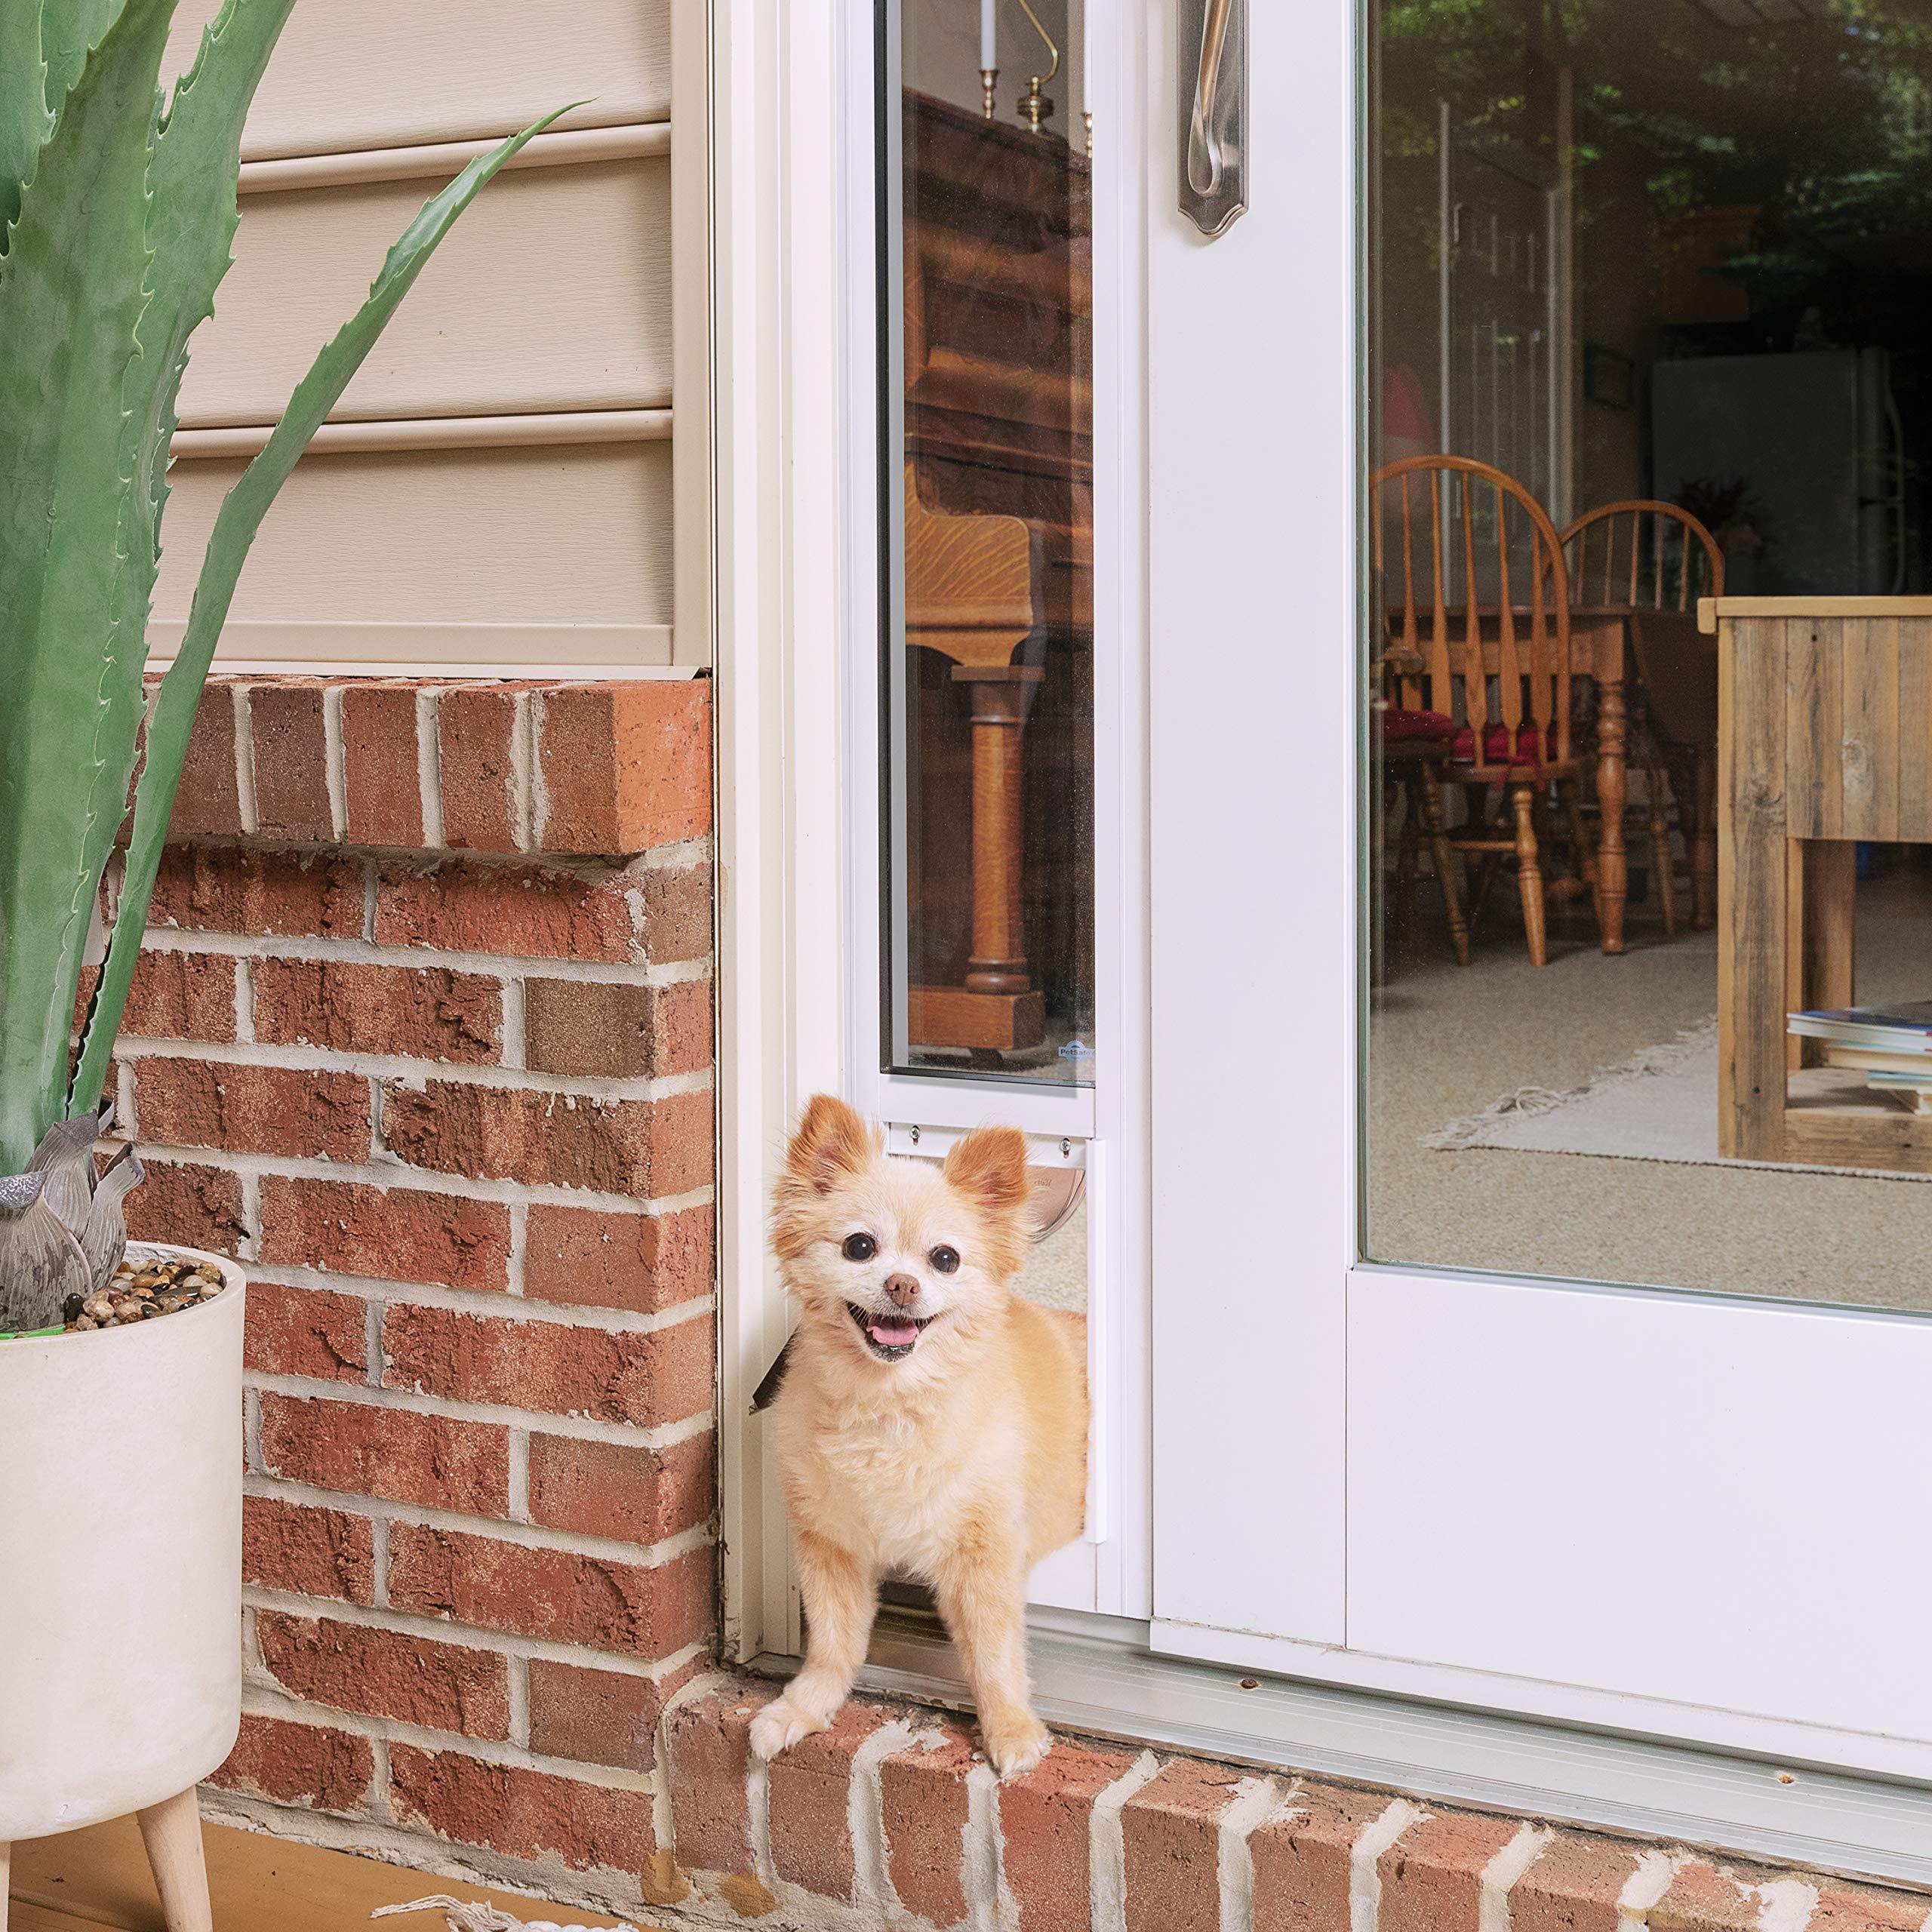 PetSafe Puerta corredera de Cristal para Mascotas: Amazon.es: Productos para mascotas